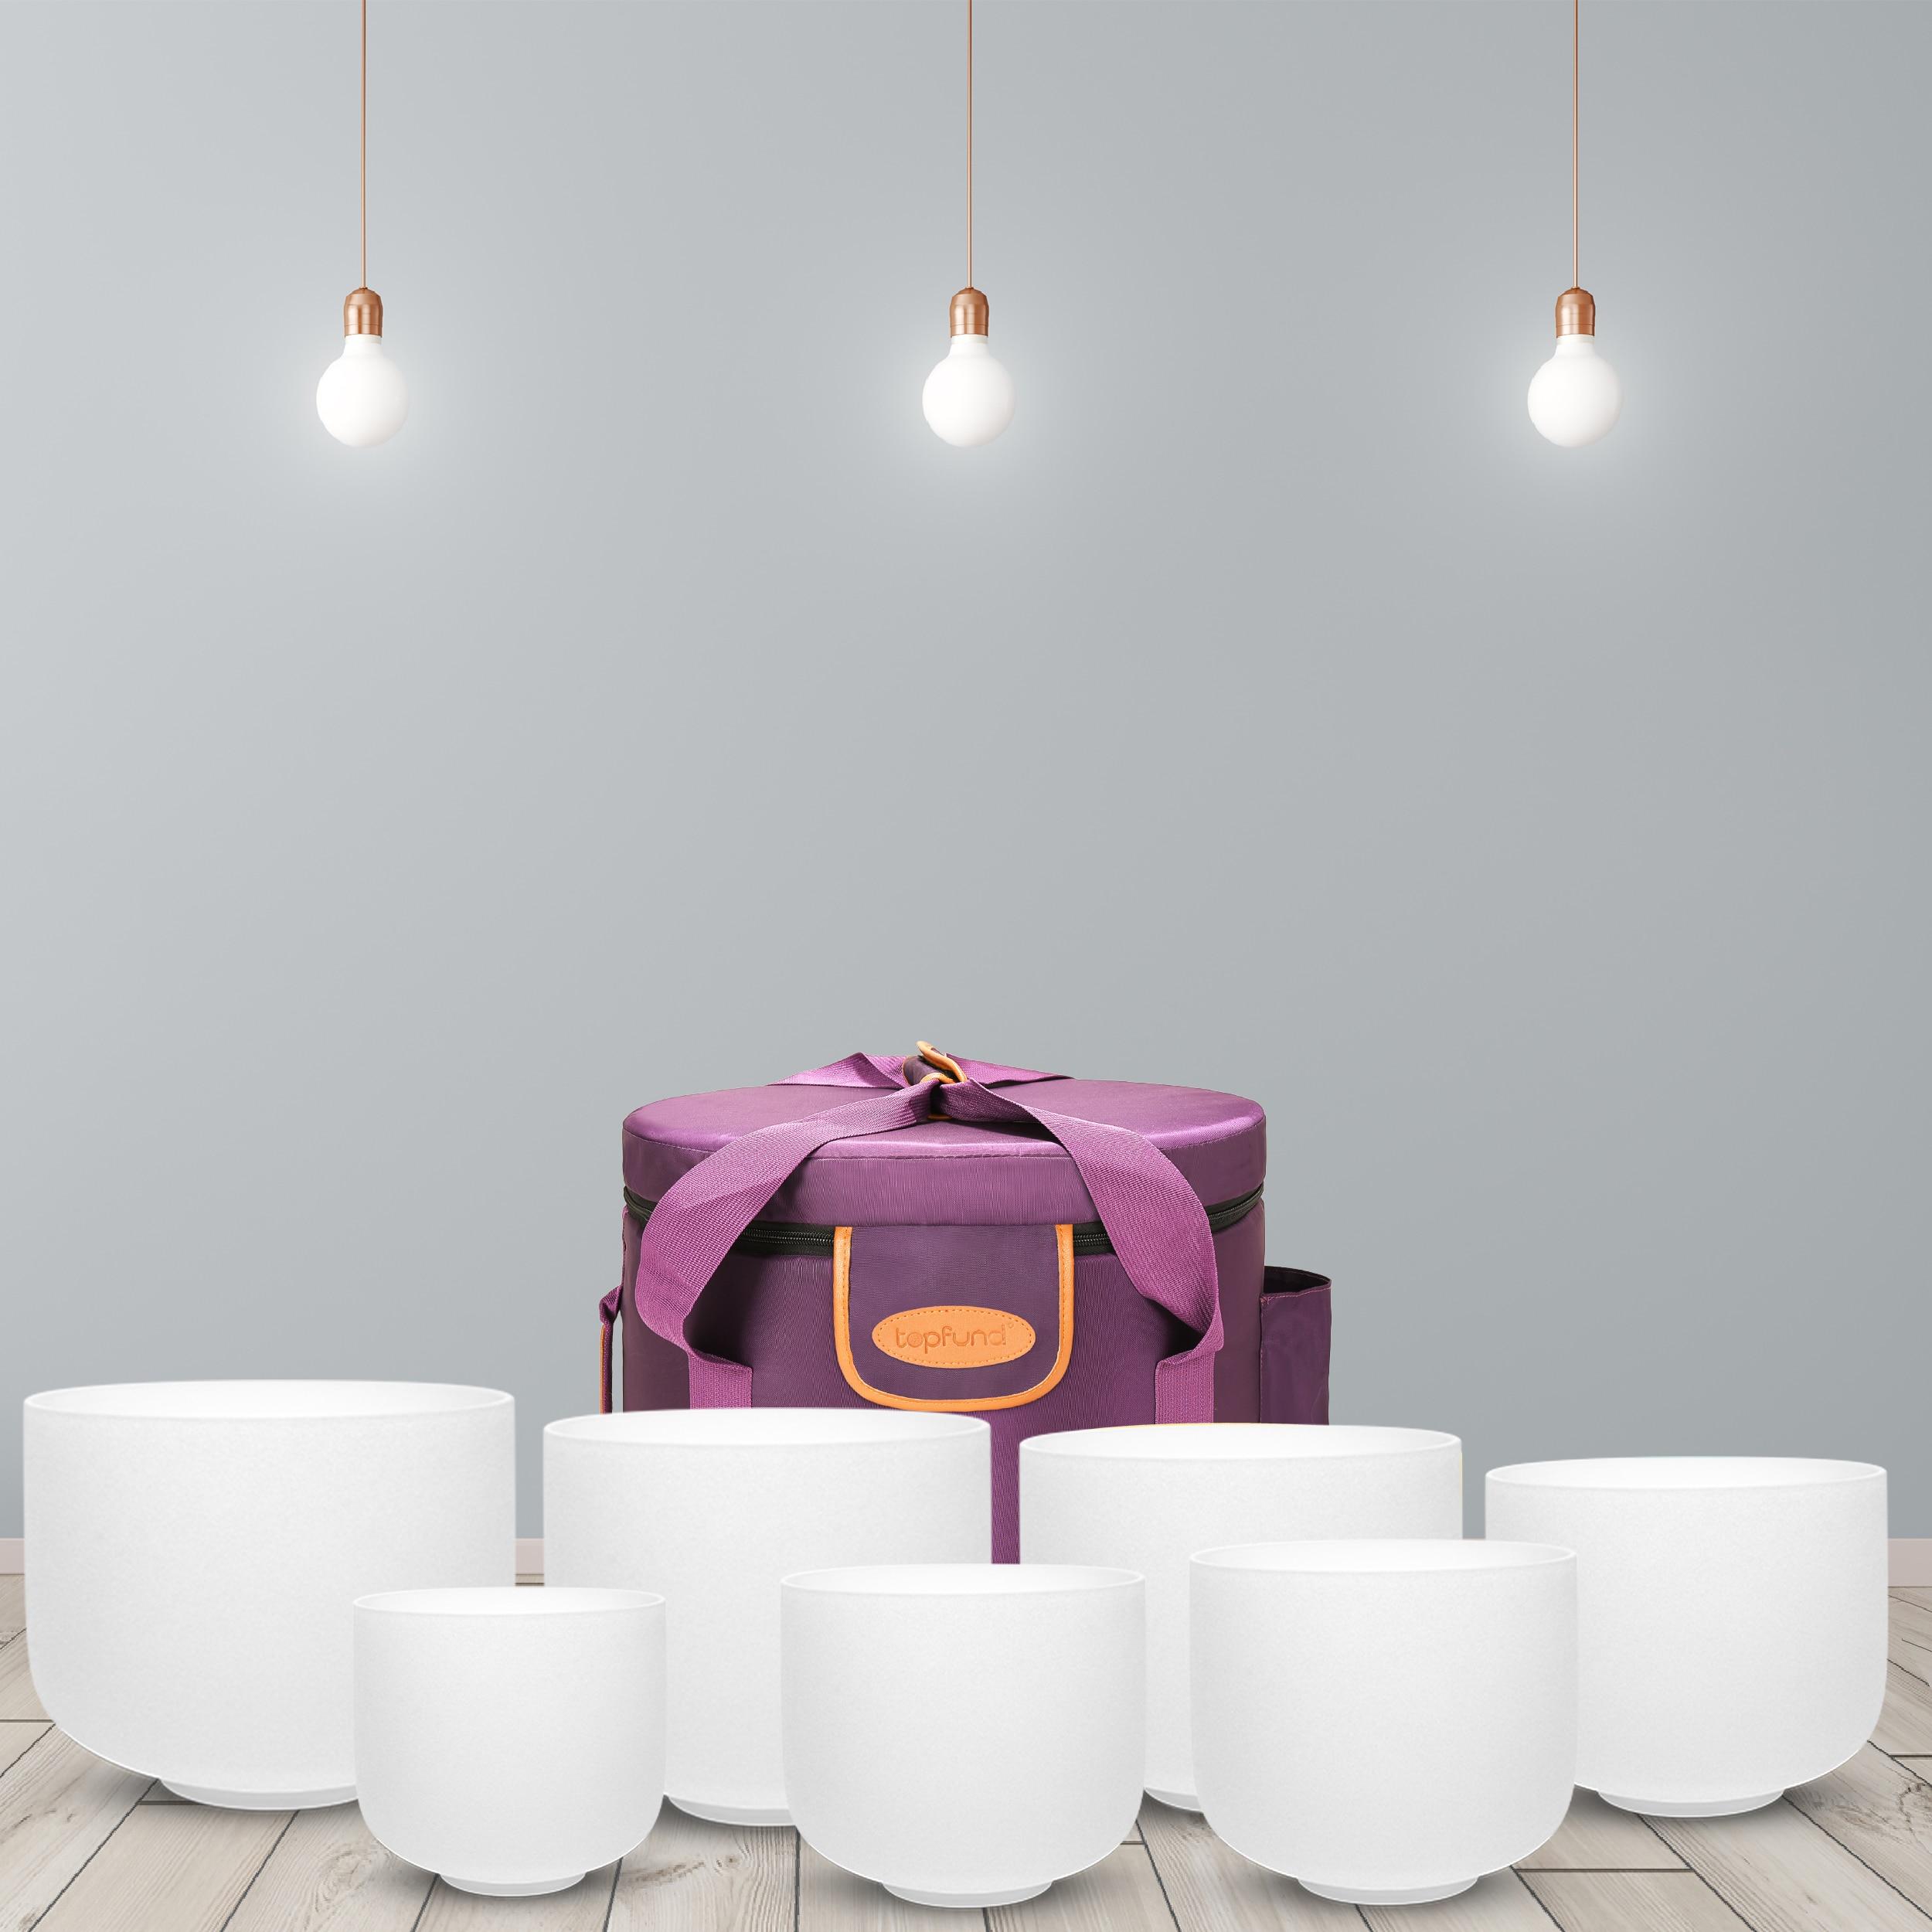 Topbox 6 ''-14 ''شقرا مجموعة من 7 قطعة متجمد الكوارتز الكريستال جرس الموسيقى